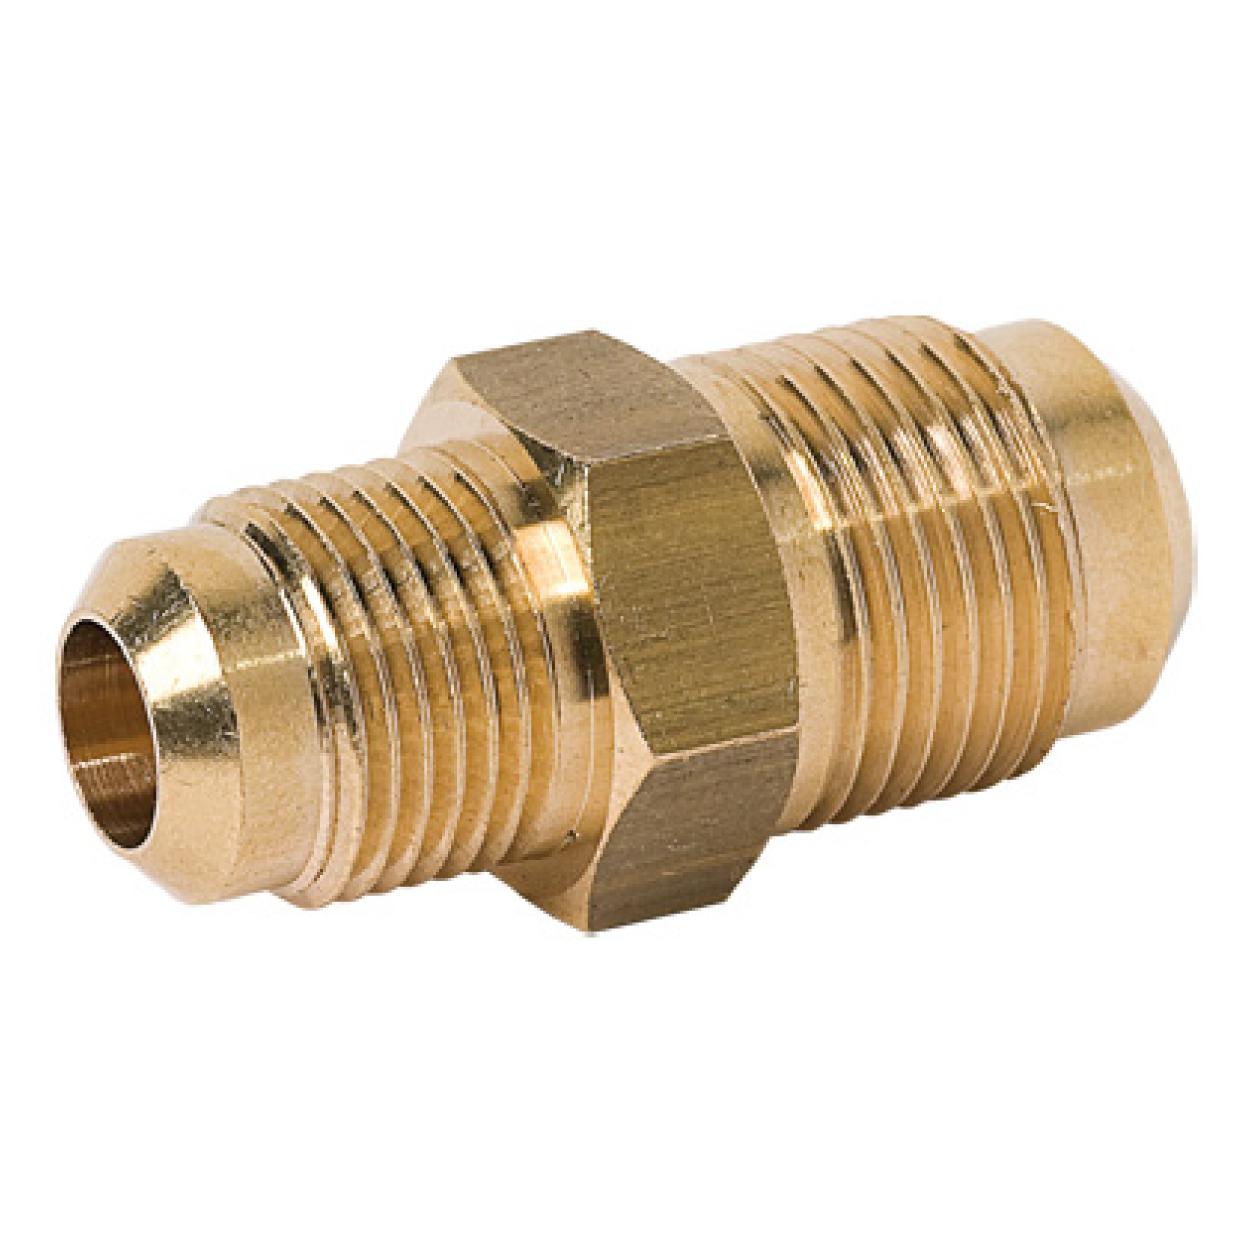 Male brass reducing union kompel kft budapest